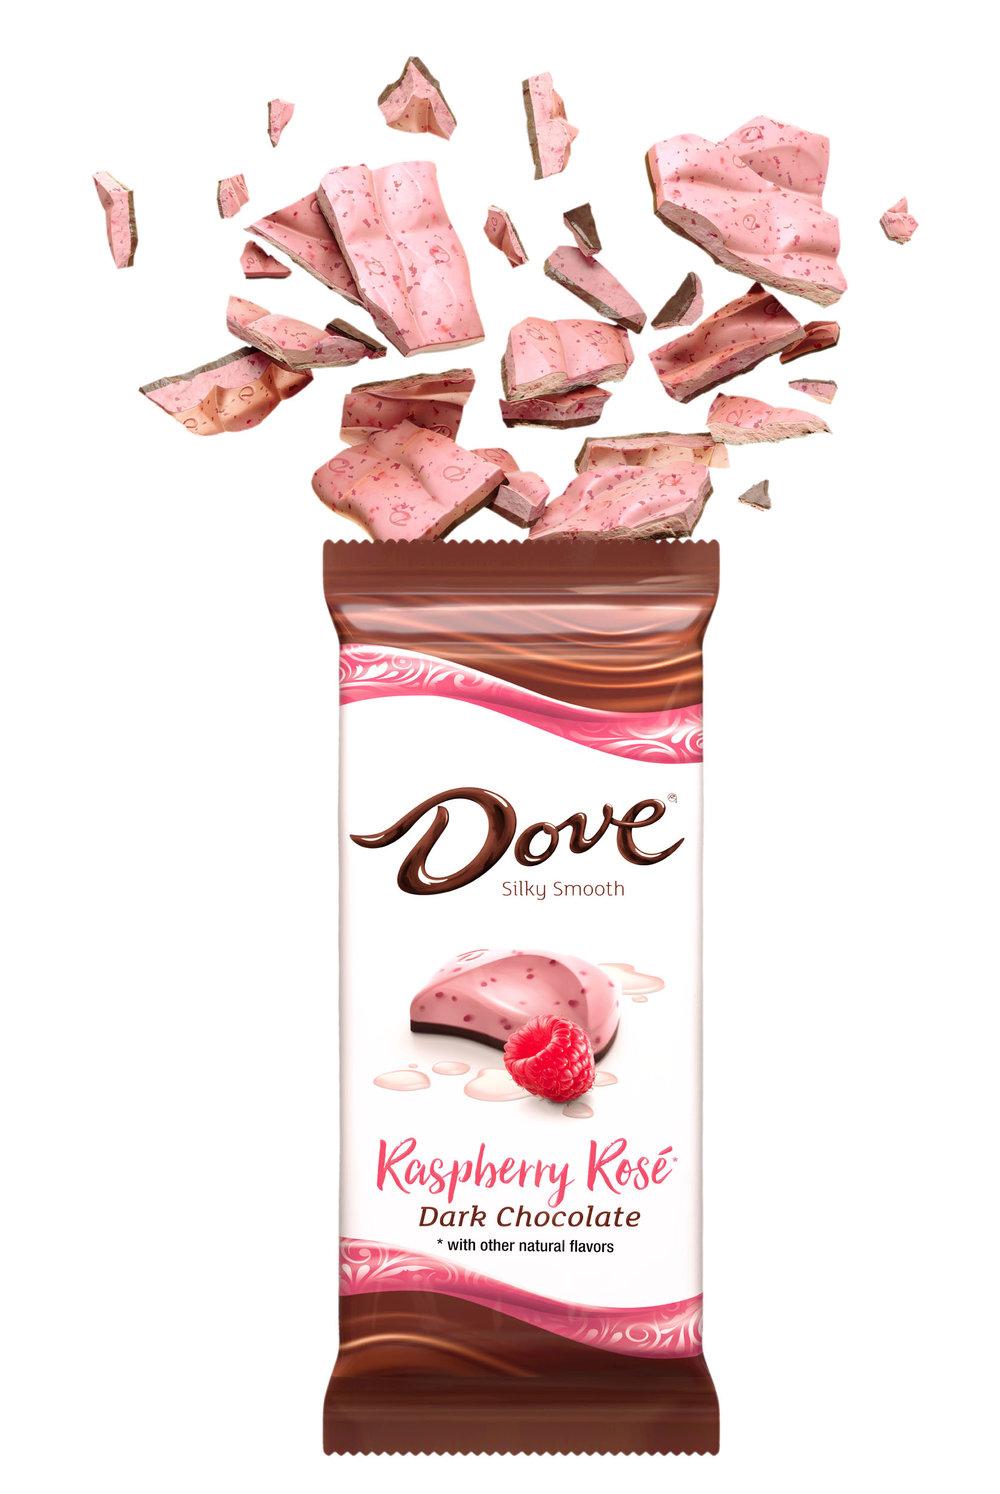 dove-chocolate-bar-raspberry-rose